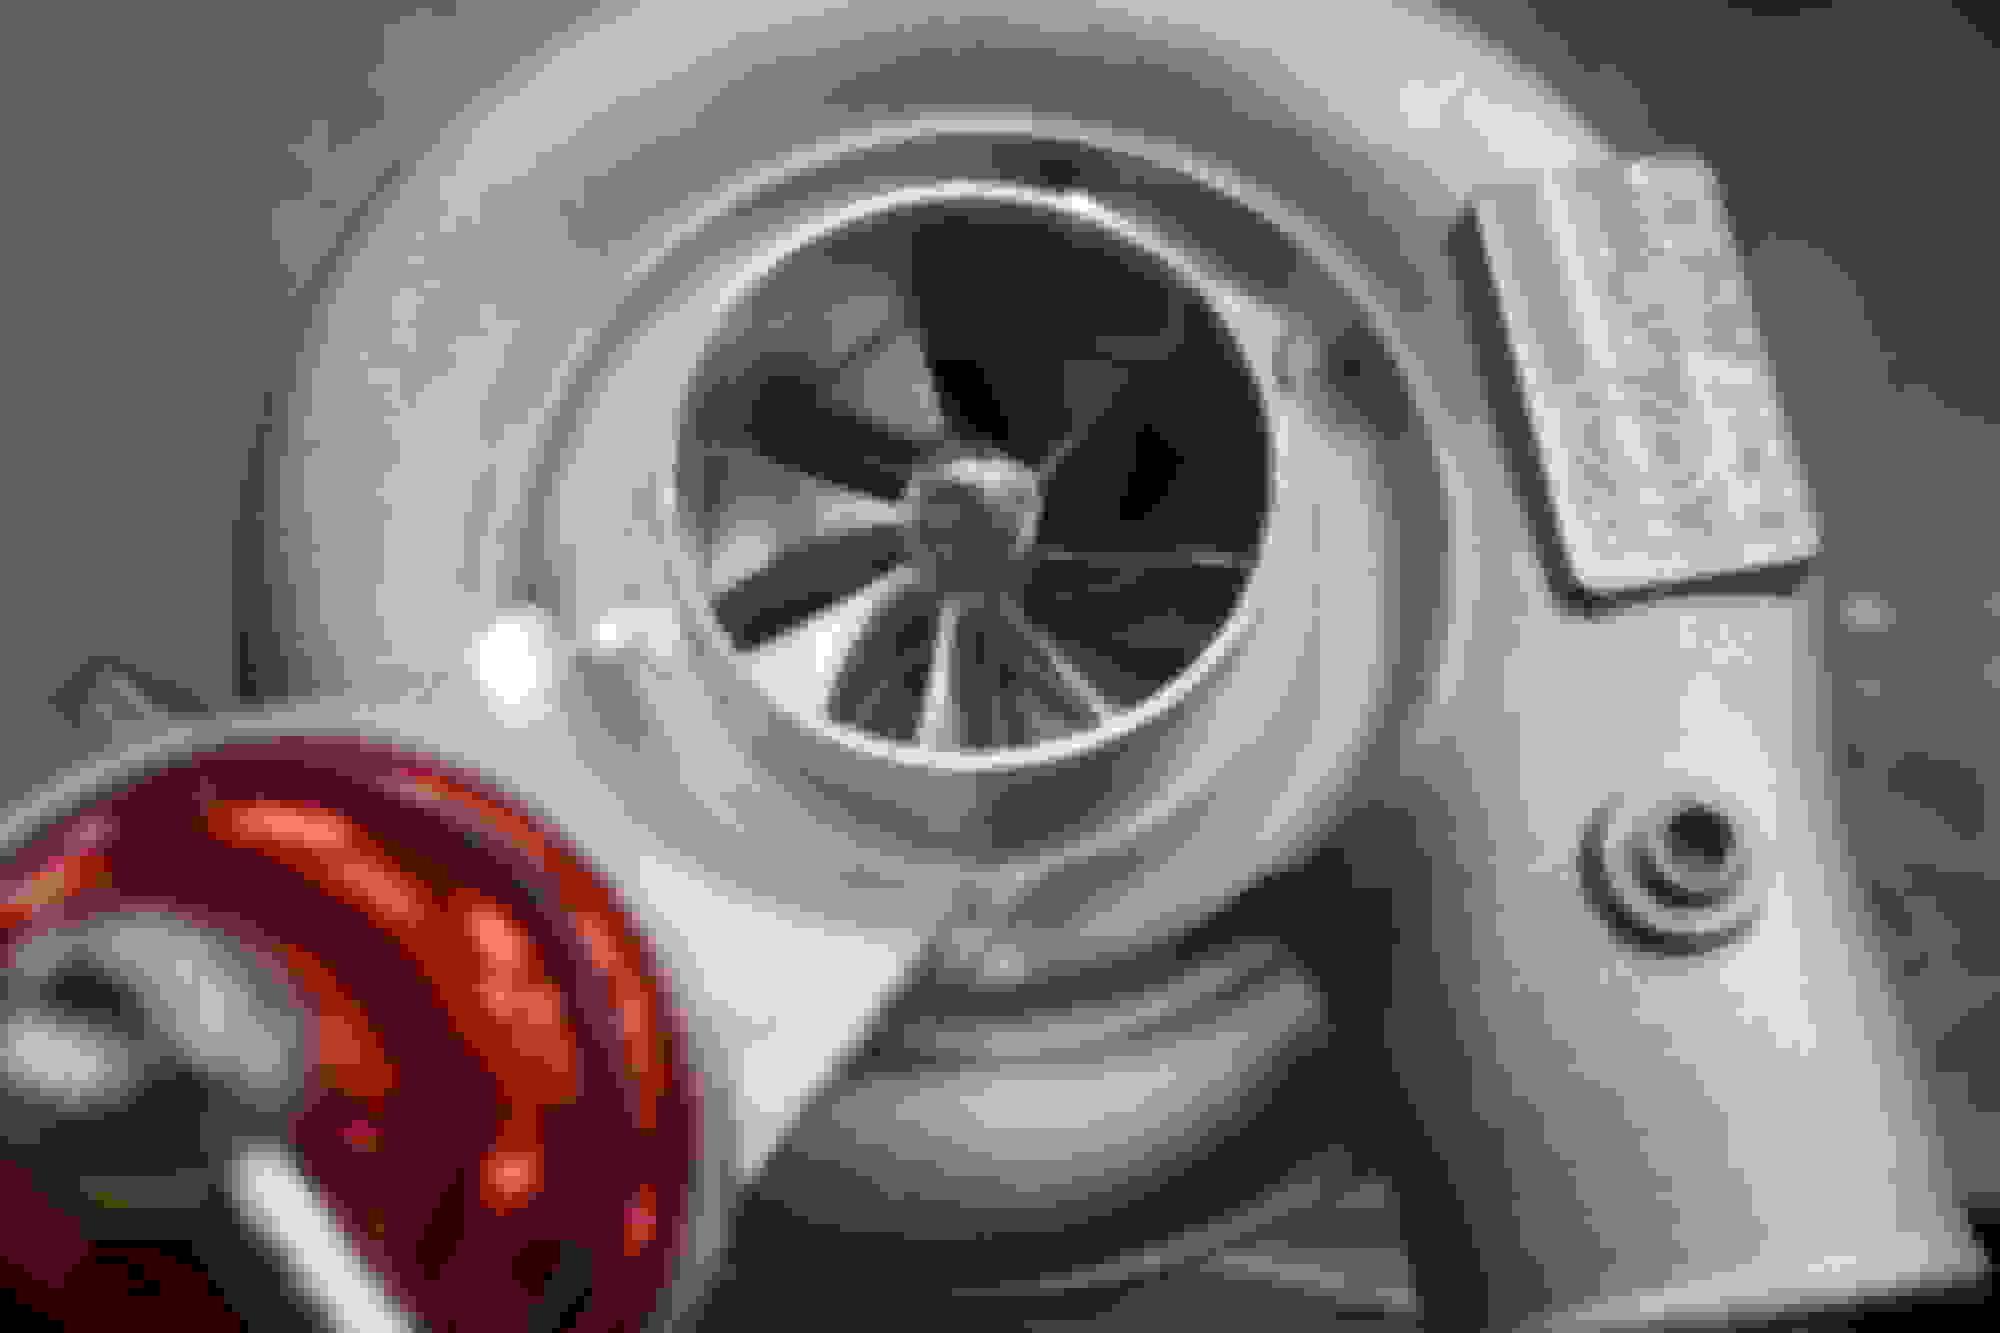 996 Turbo 1,000hp build! - 6SpeedOnline - Porsche Forum and Luxury